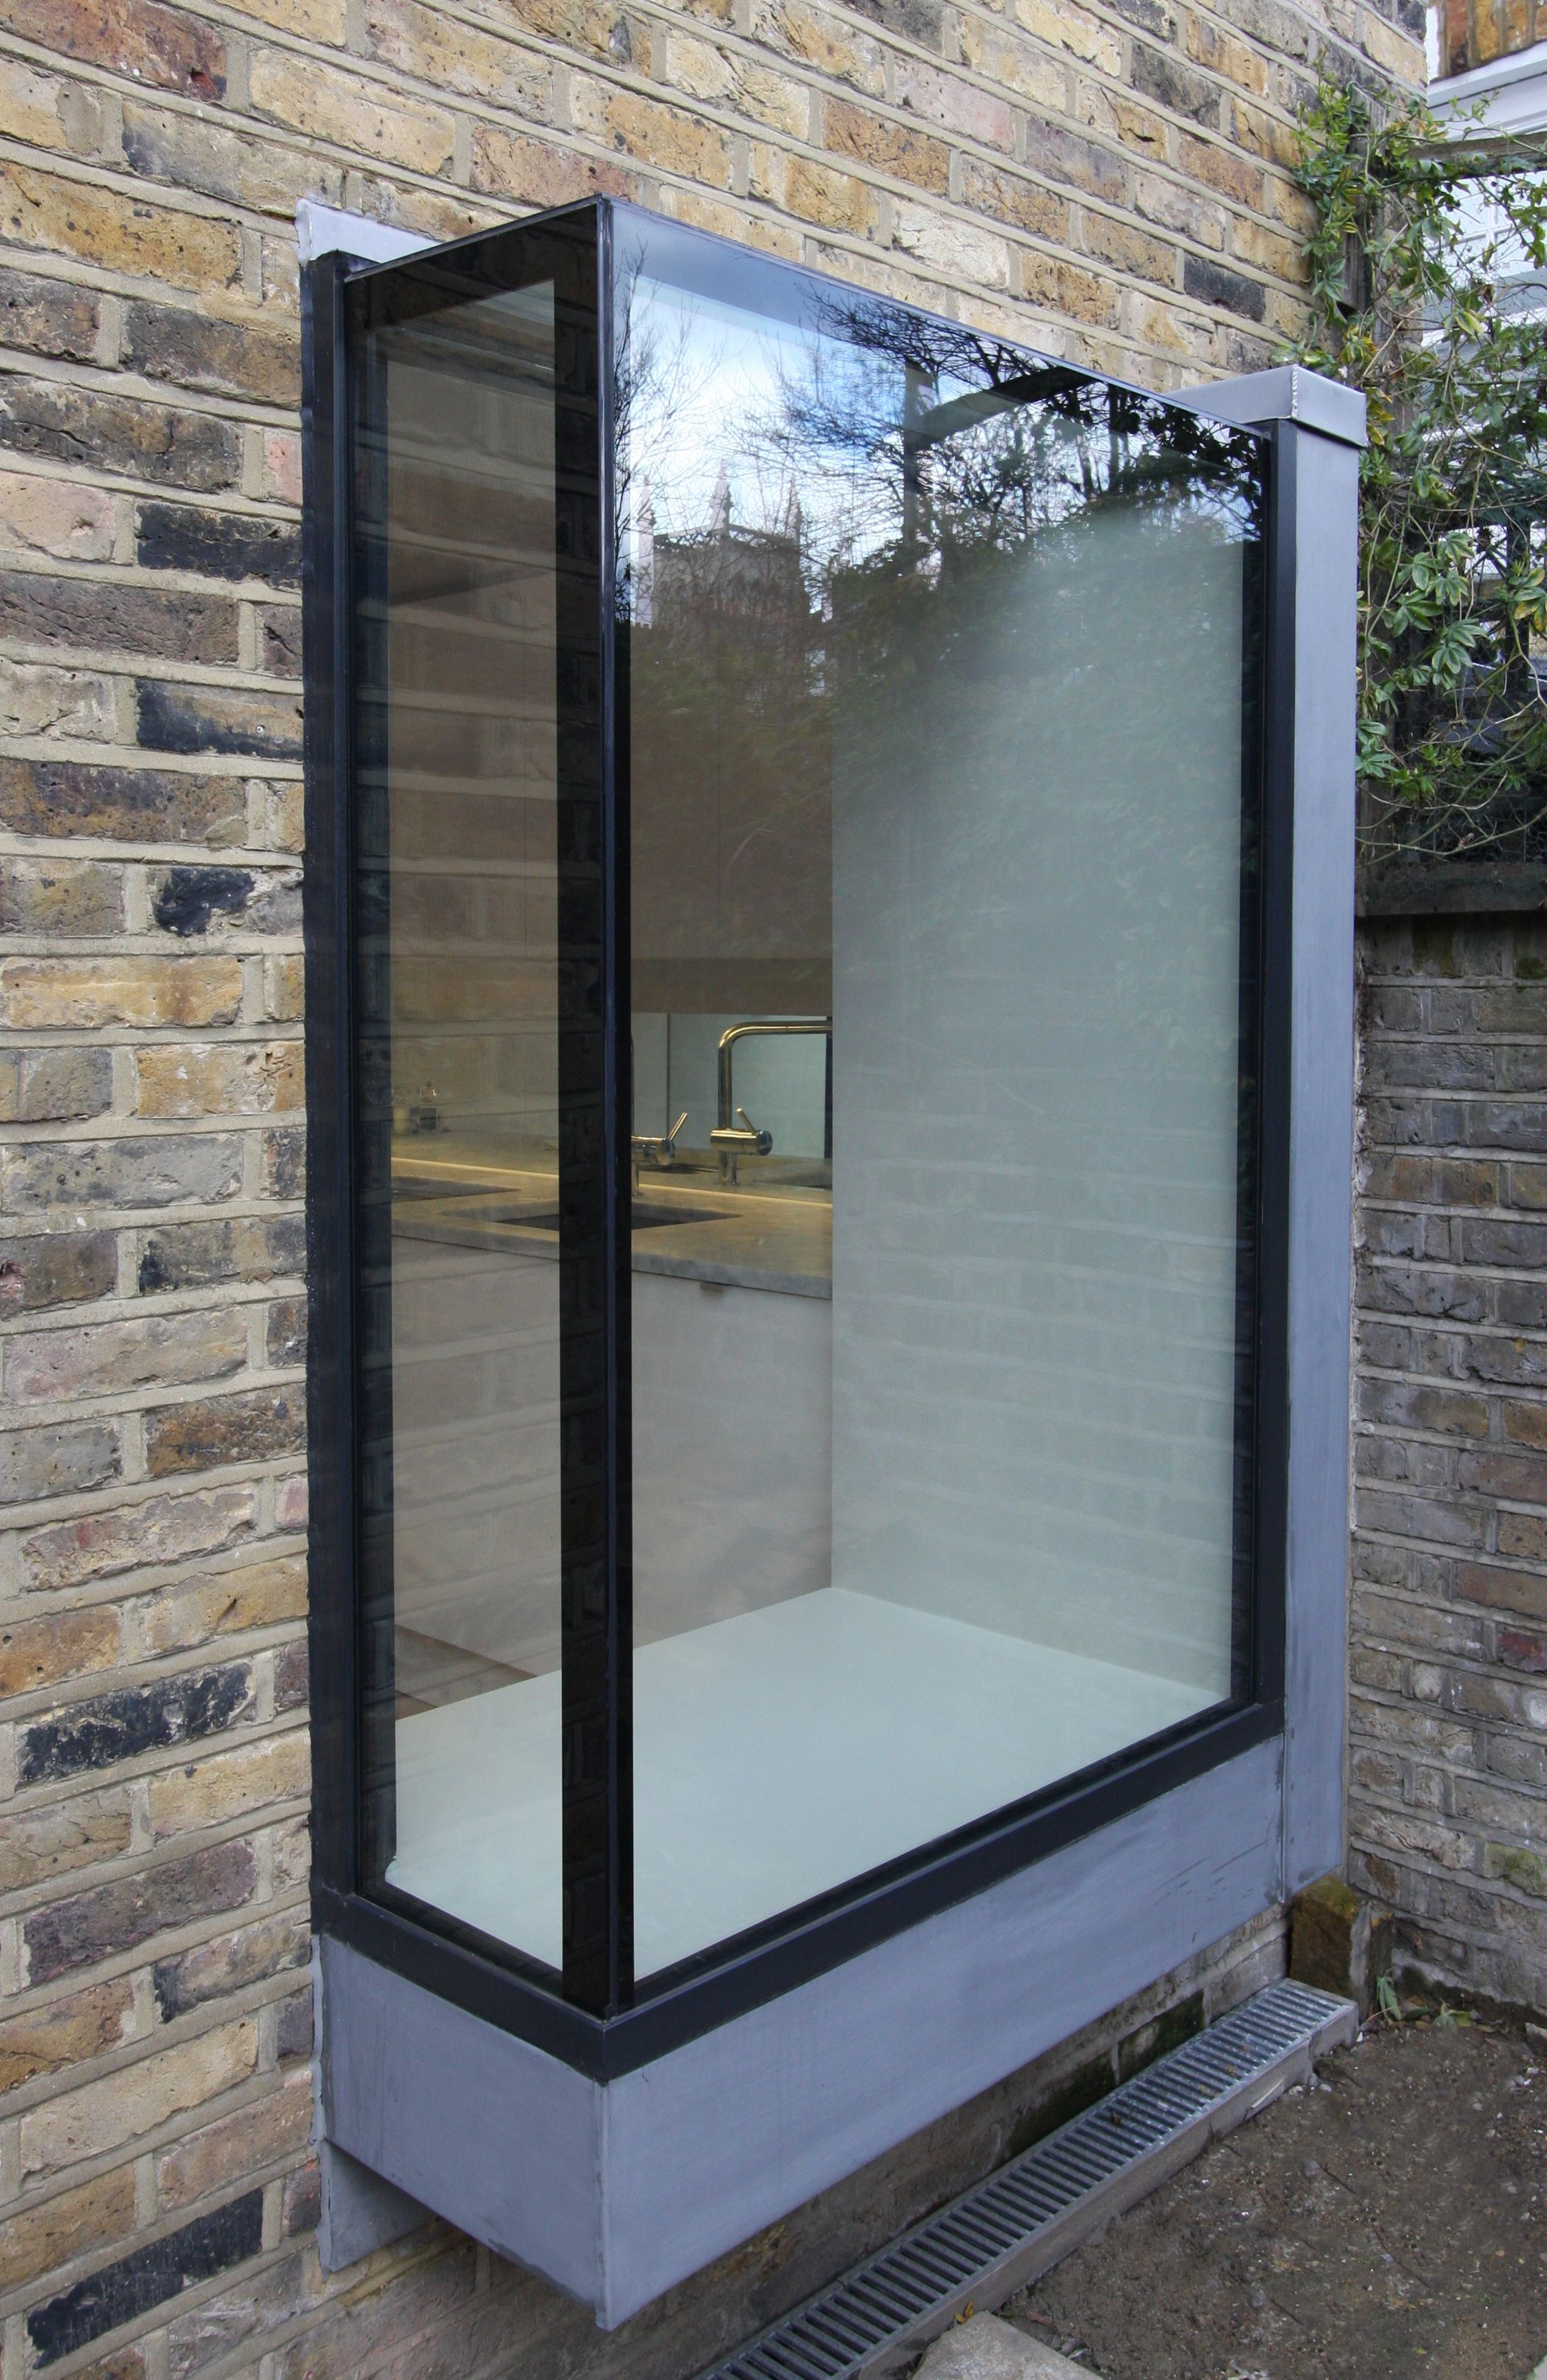 frameless glass box seat to residential property www